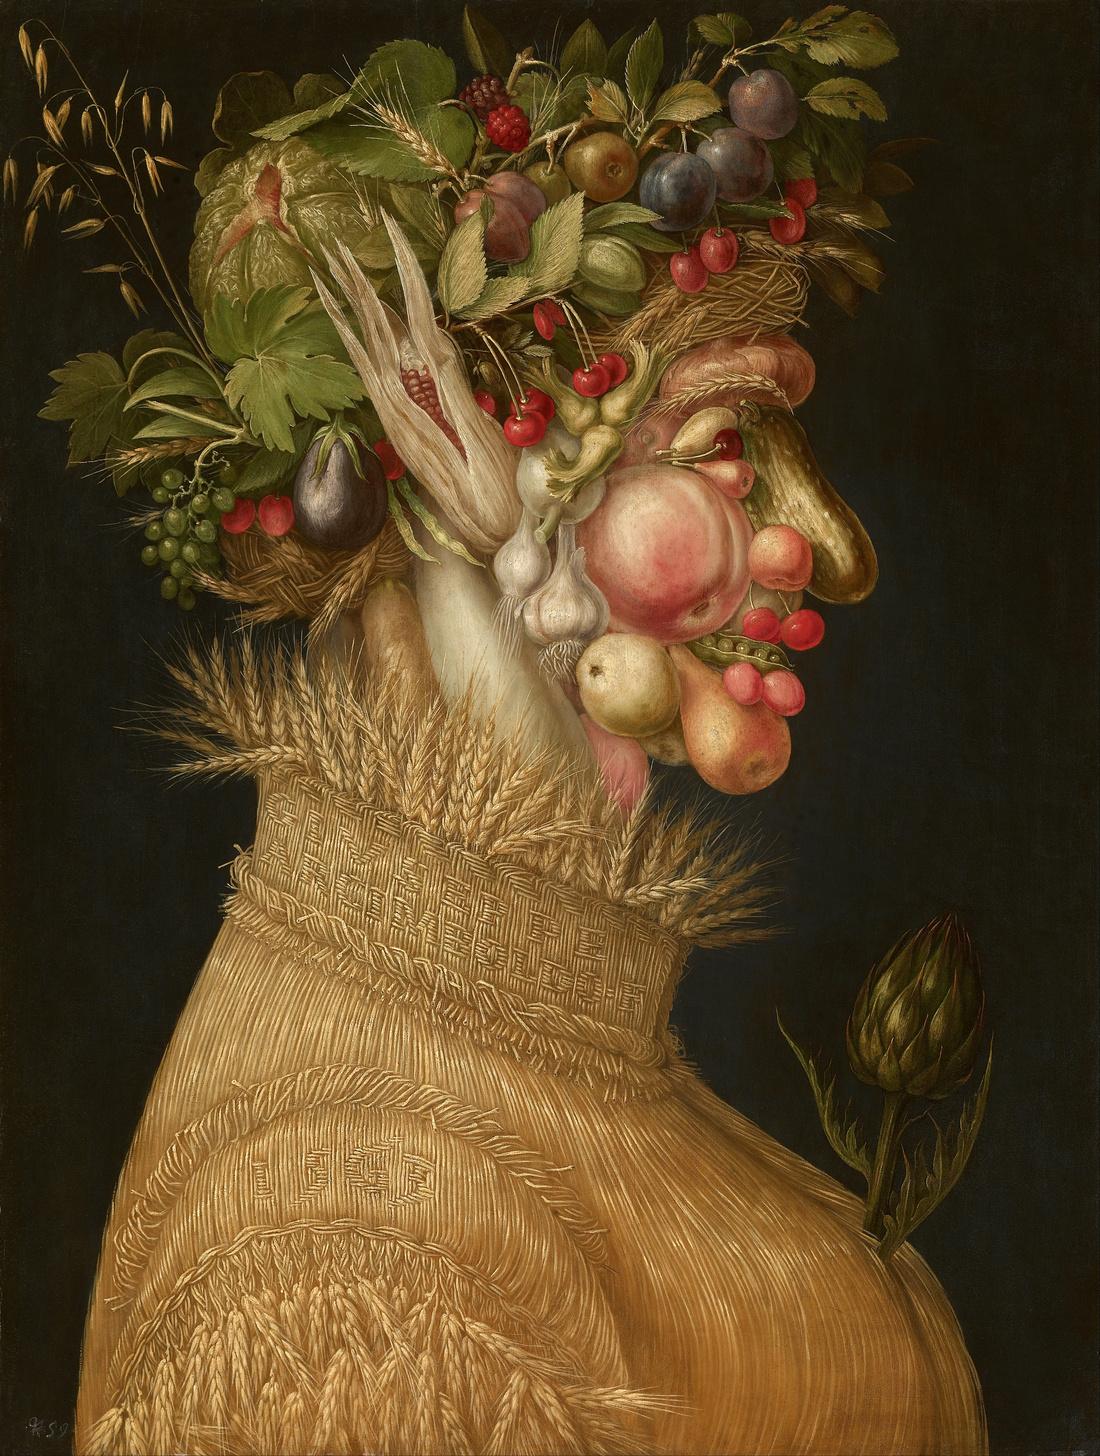 Giuseppe Arcimboldo, The Summer, 1563. Image via Wikimedia Commons.